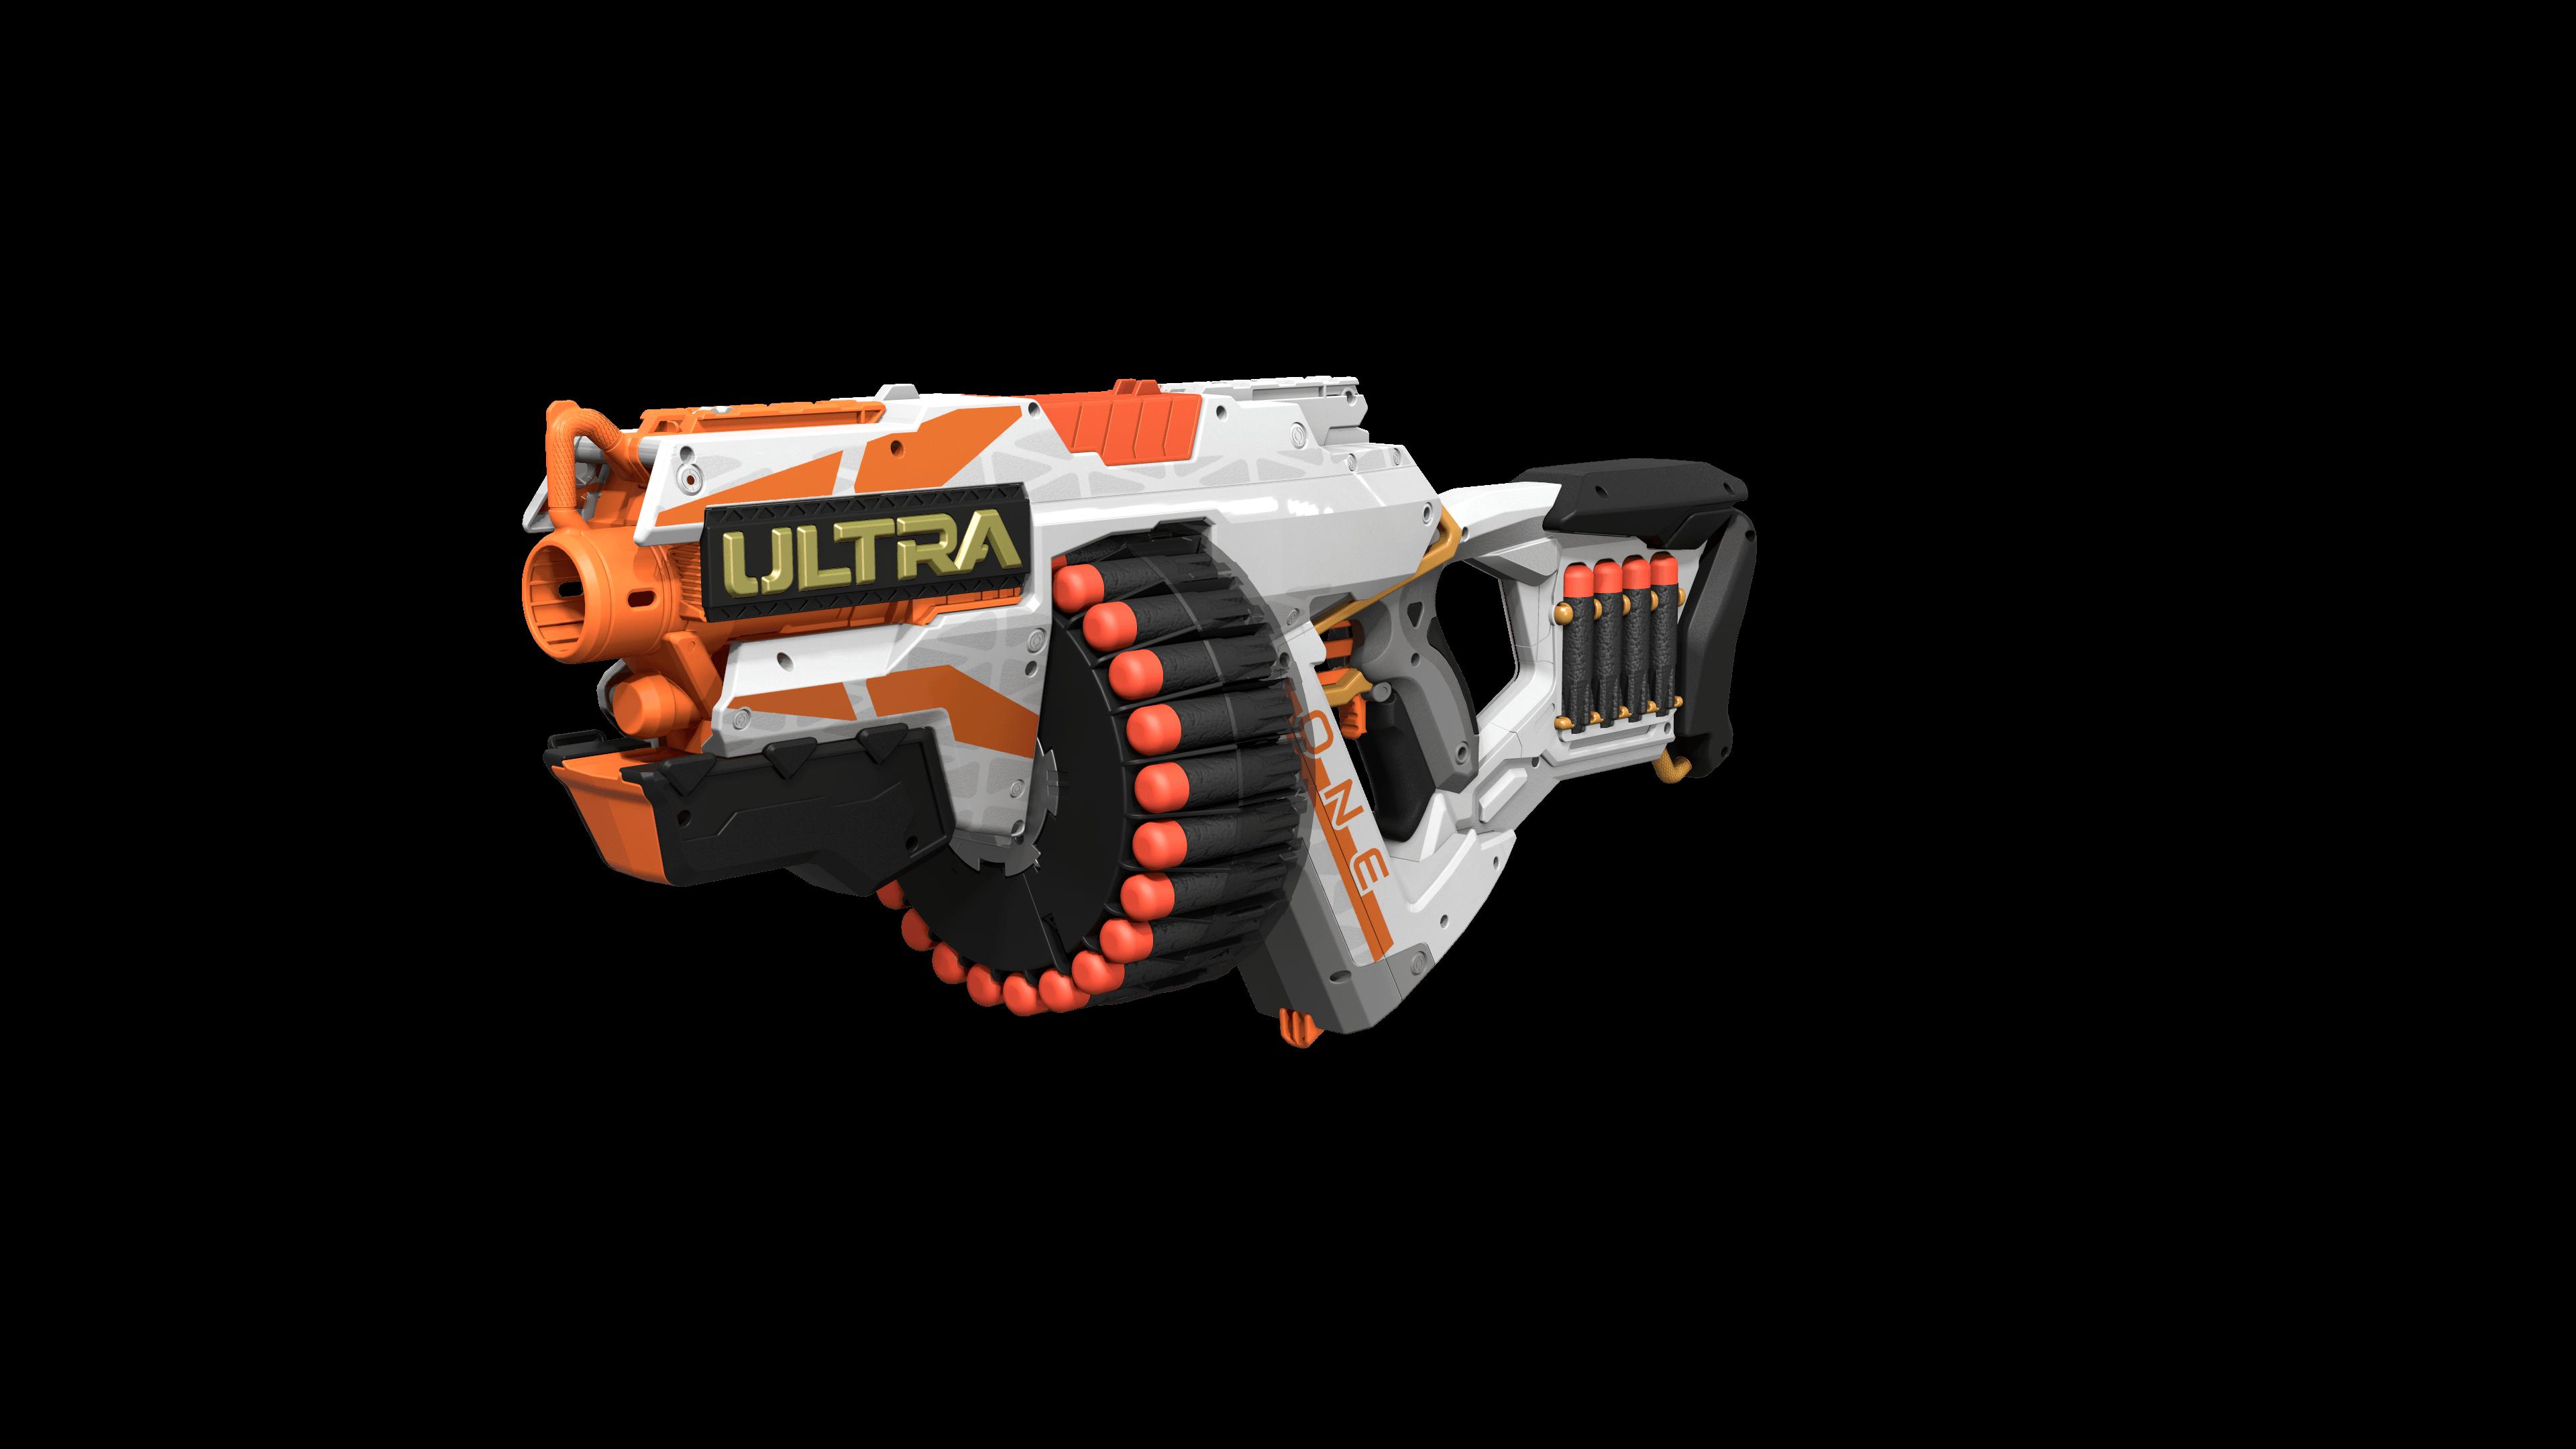 ultra blaster img 78